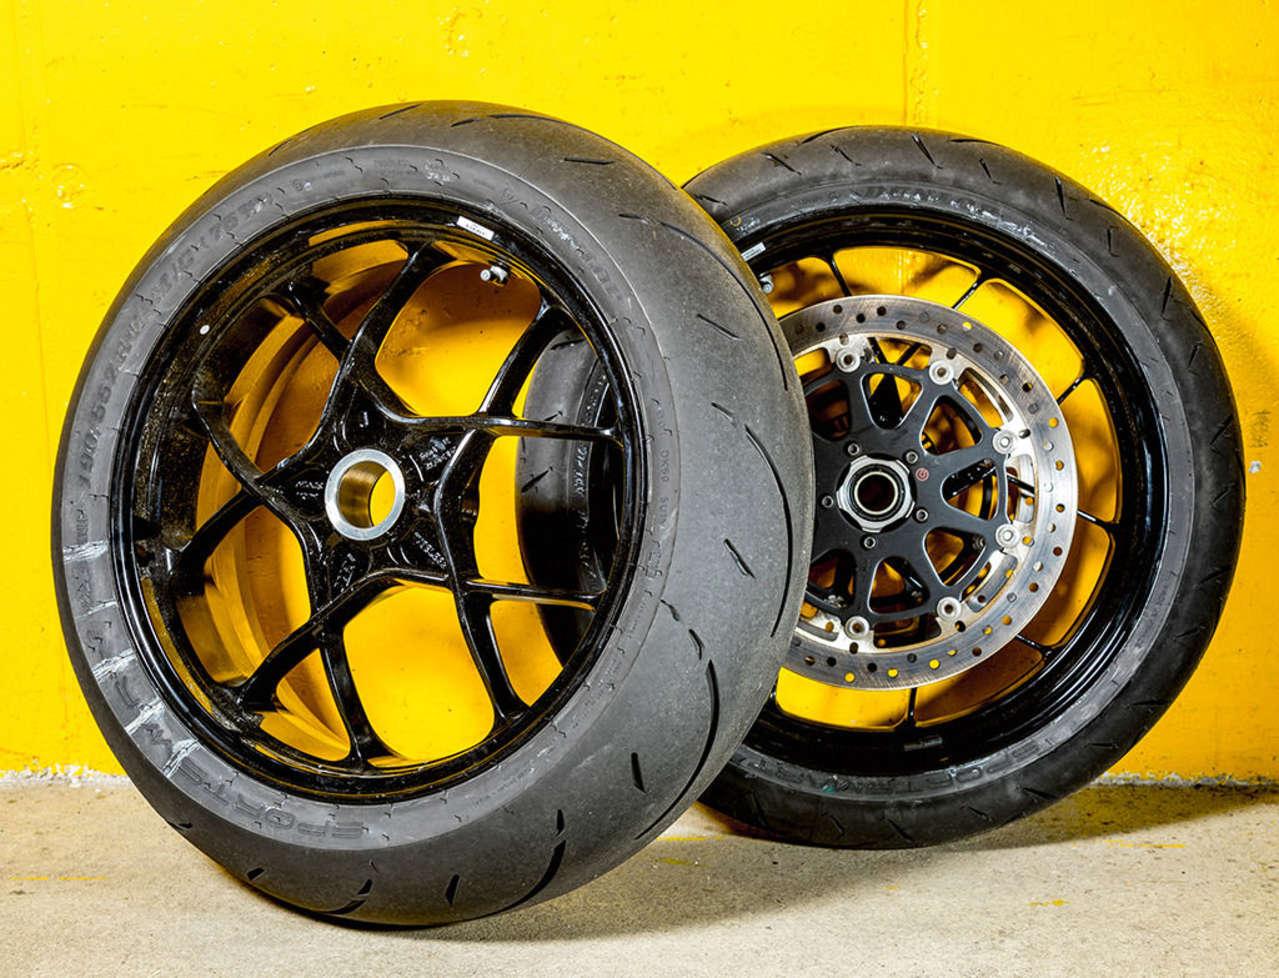 Dunlop Sportmax 2 Max